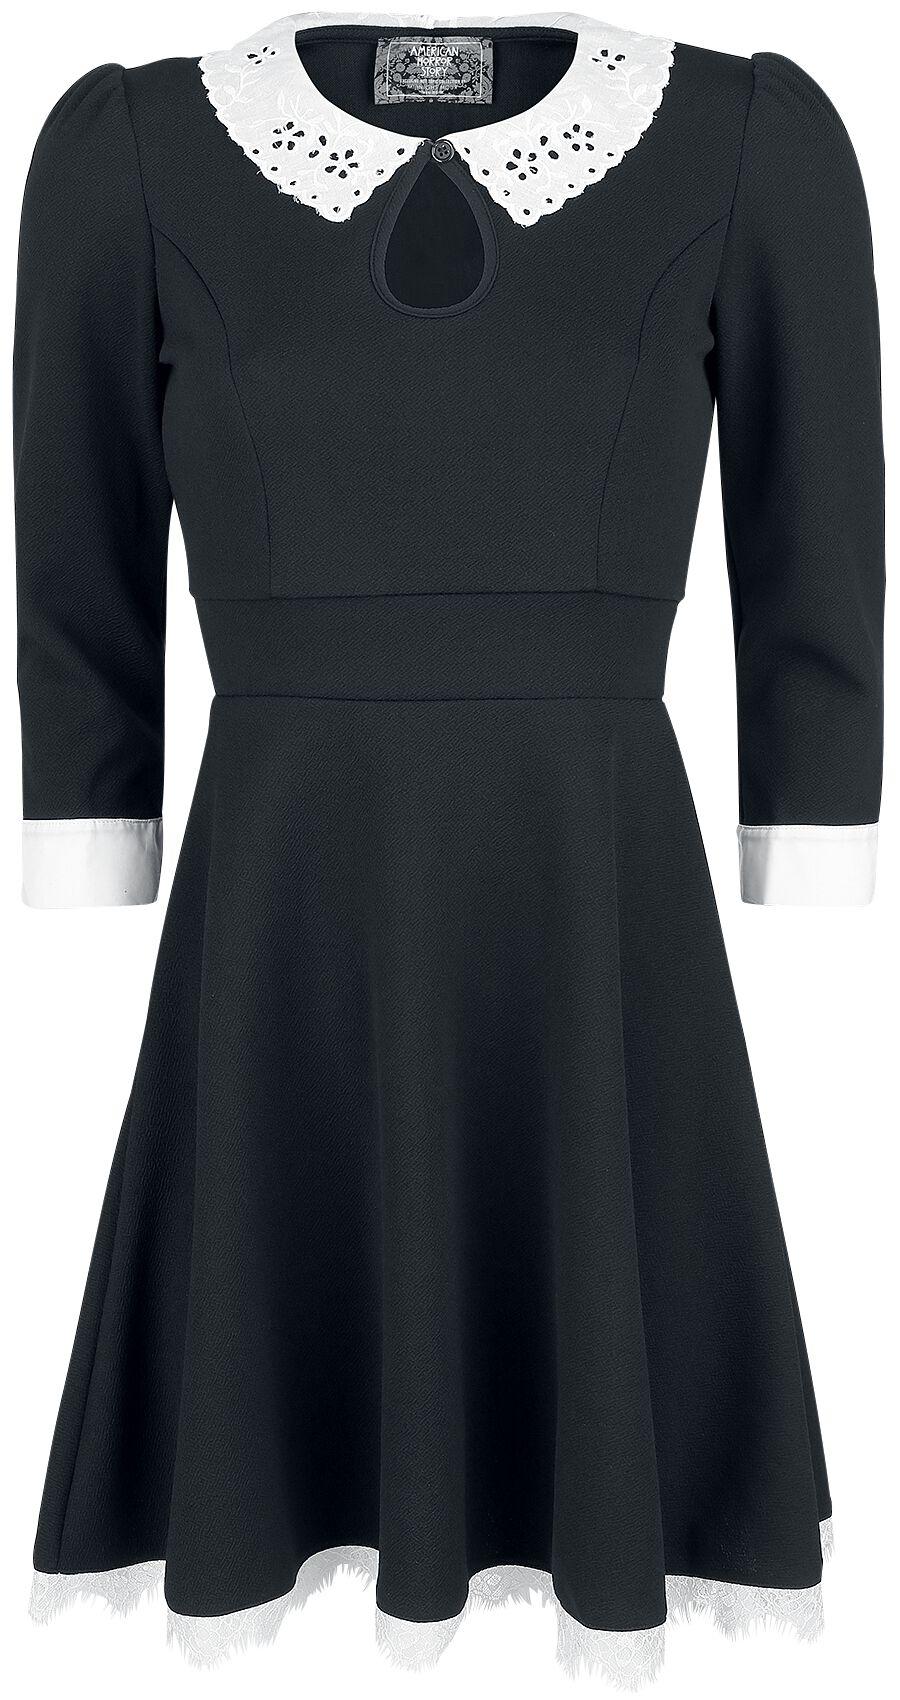 Image of American Horror Story Moira O'Hara - Cosplay Kleid schwarz/weiß